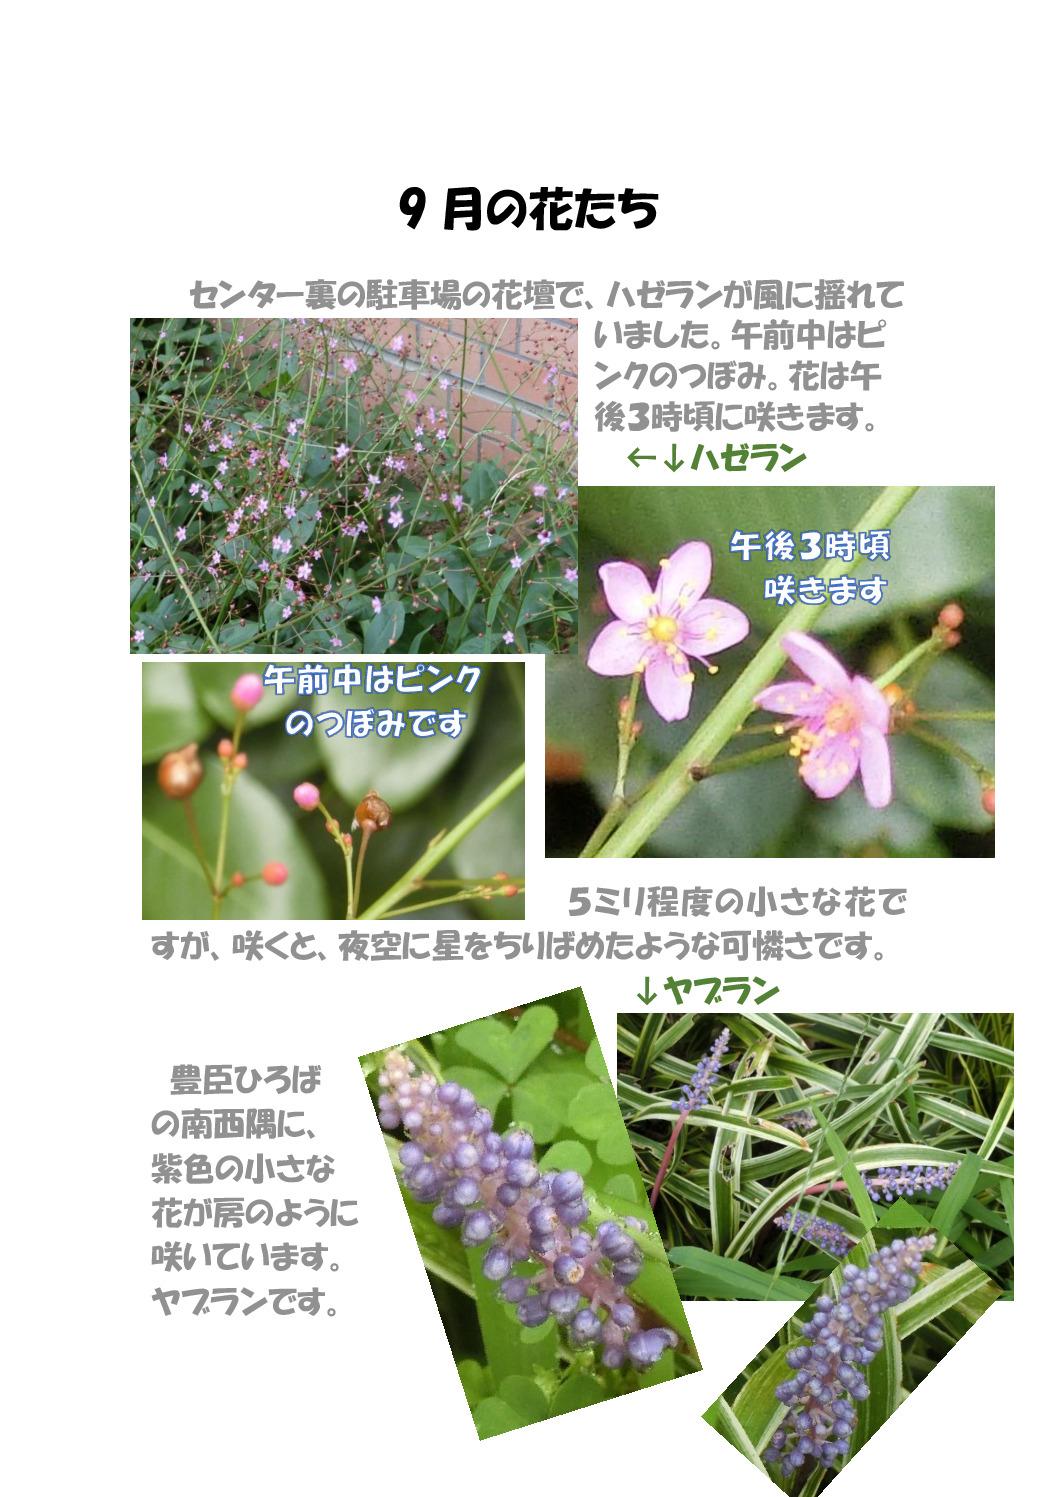 thumbnail of 9月の花たち